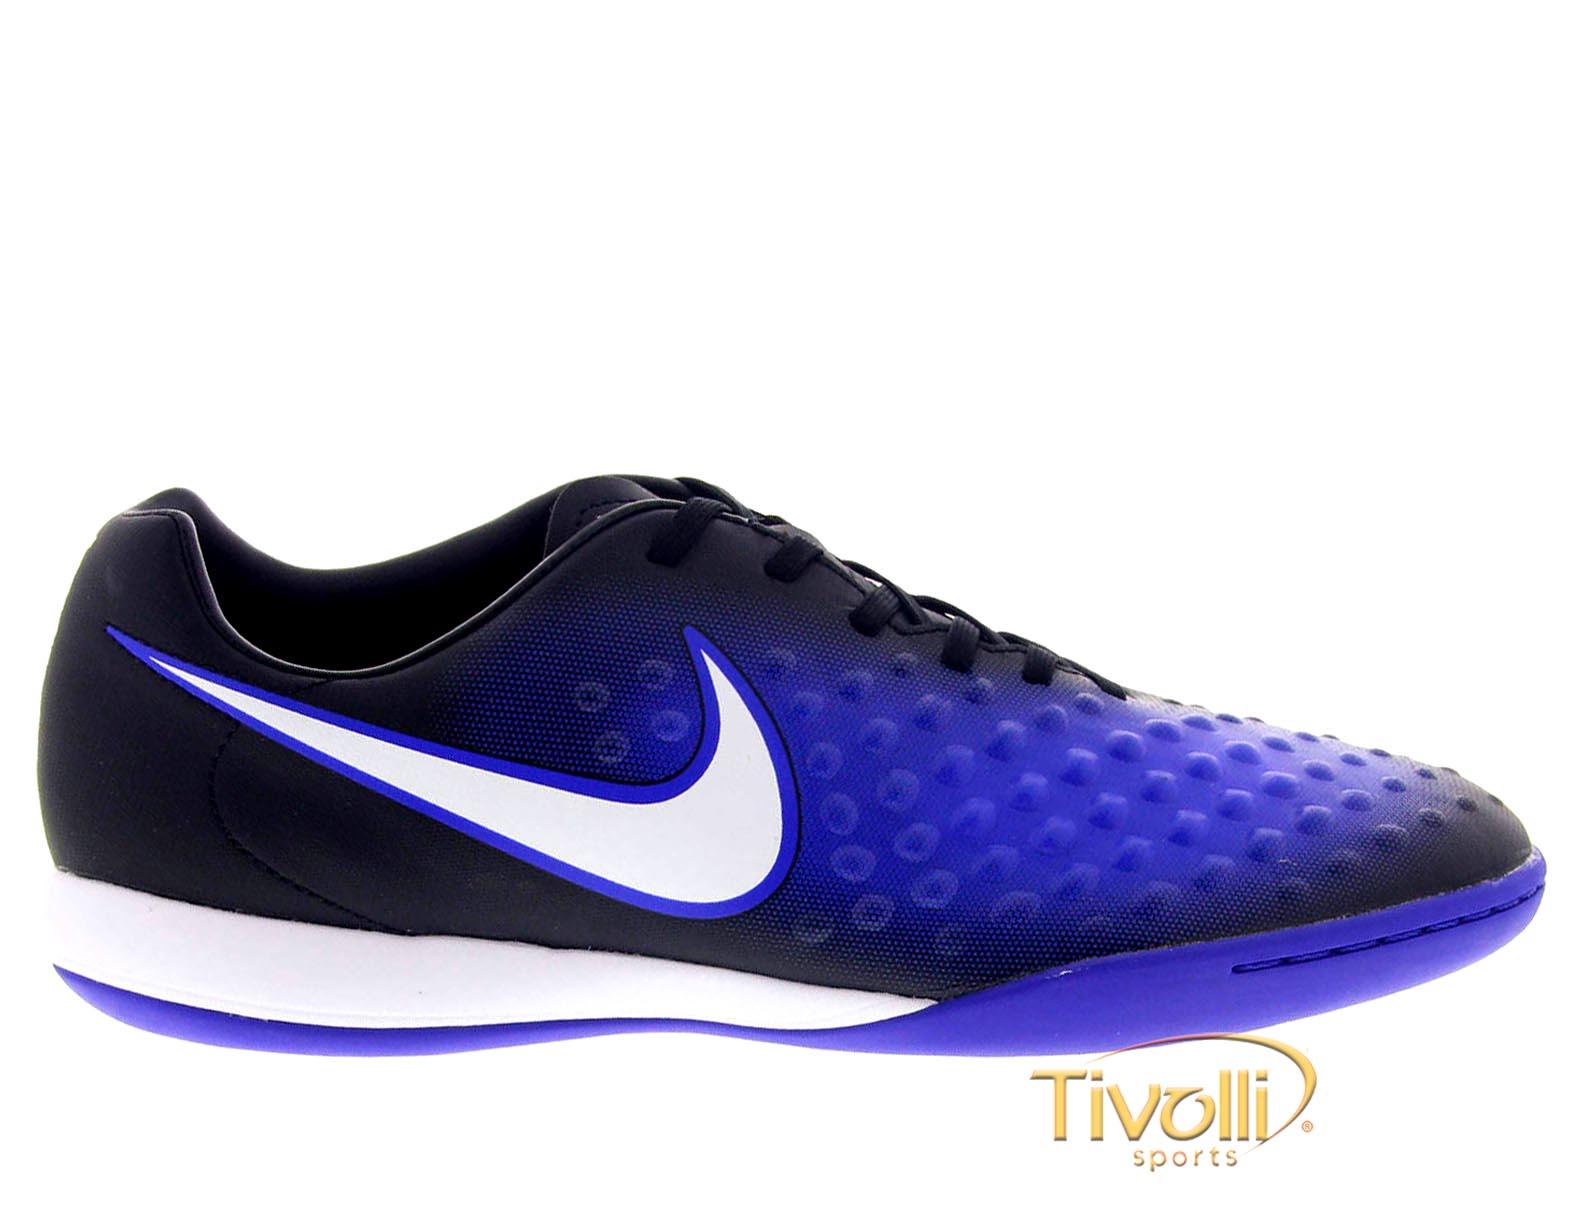 Chuteira Nike JR. MagistaX Opus II IC Futsal Infantil     cb49b8e4e253f